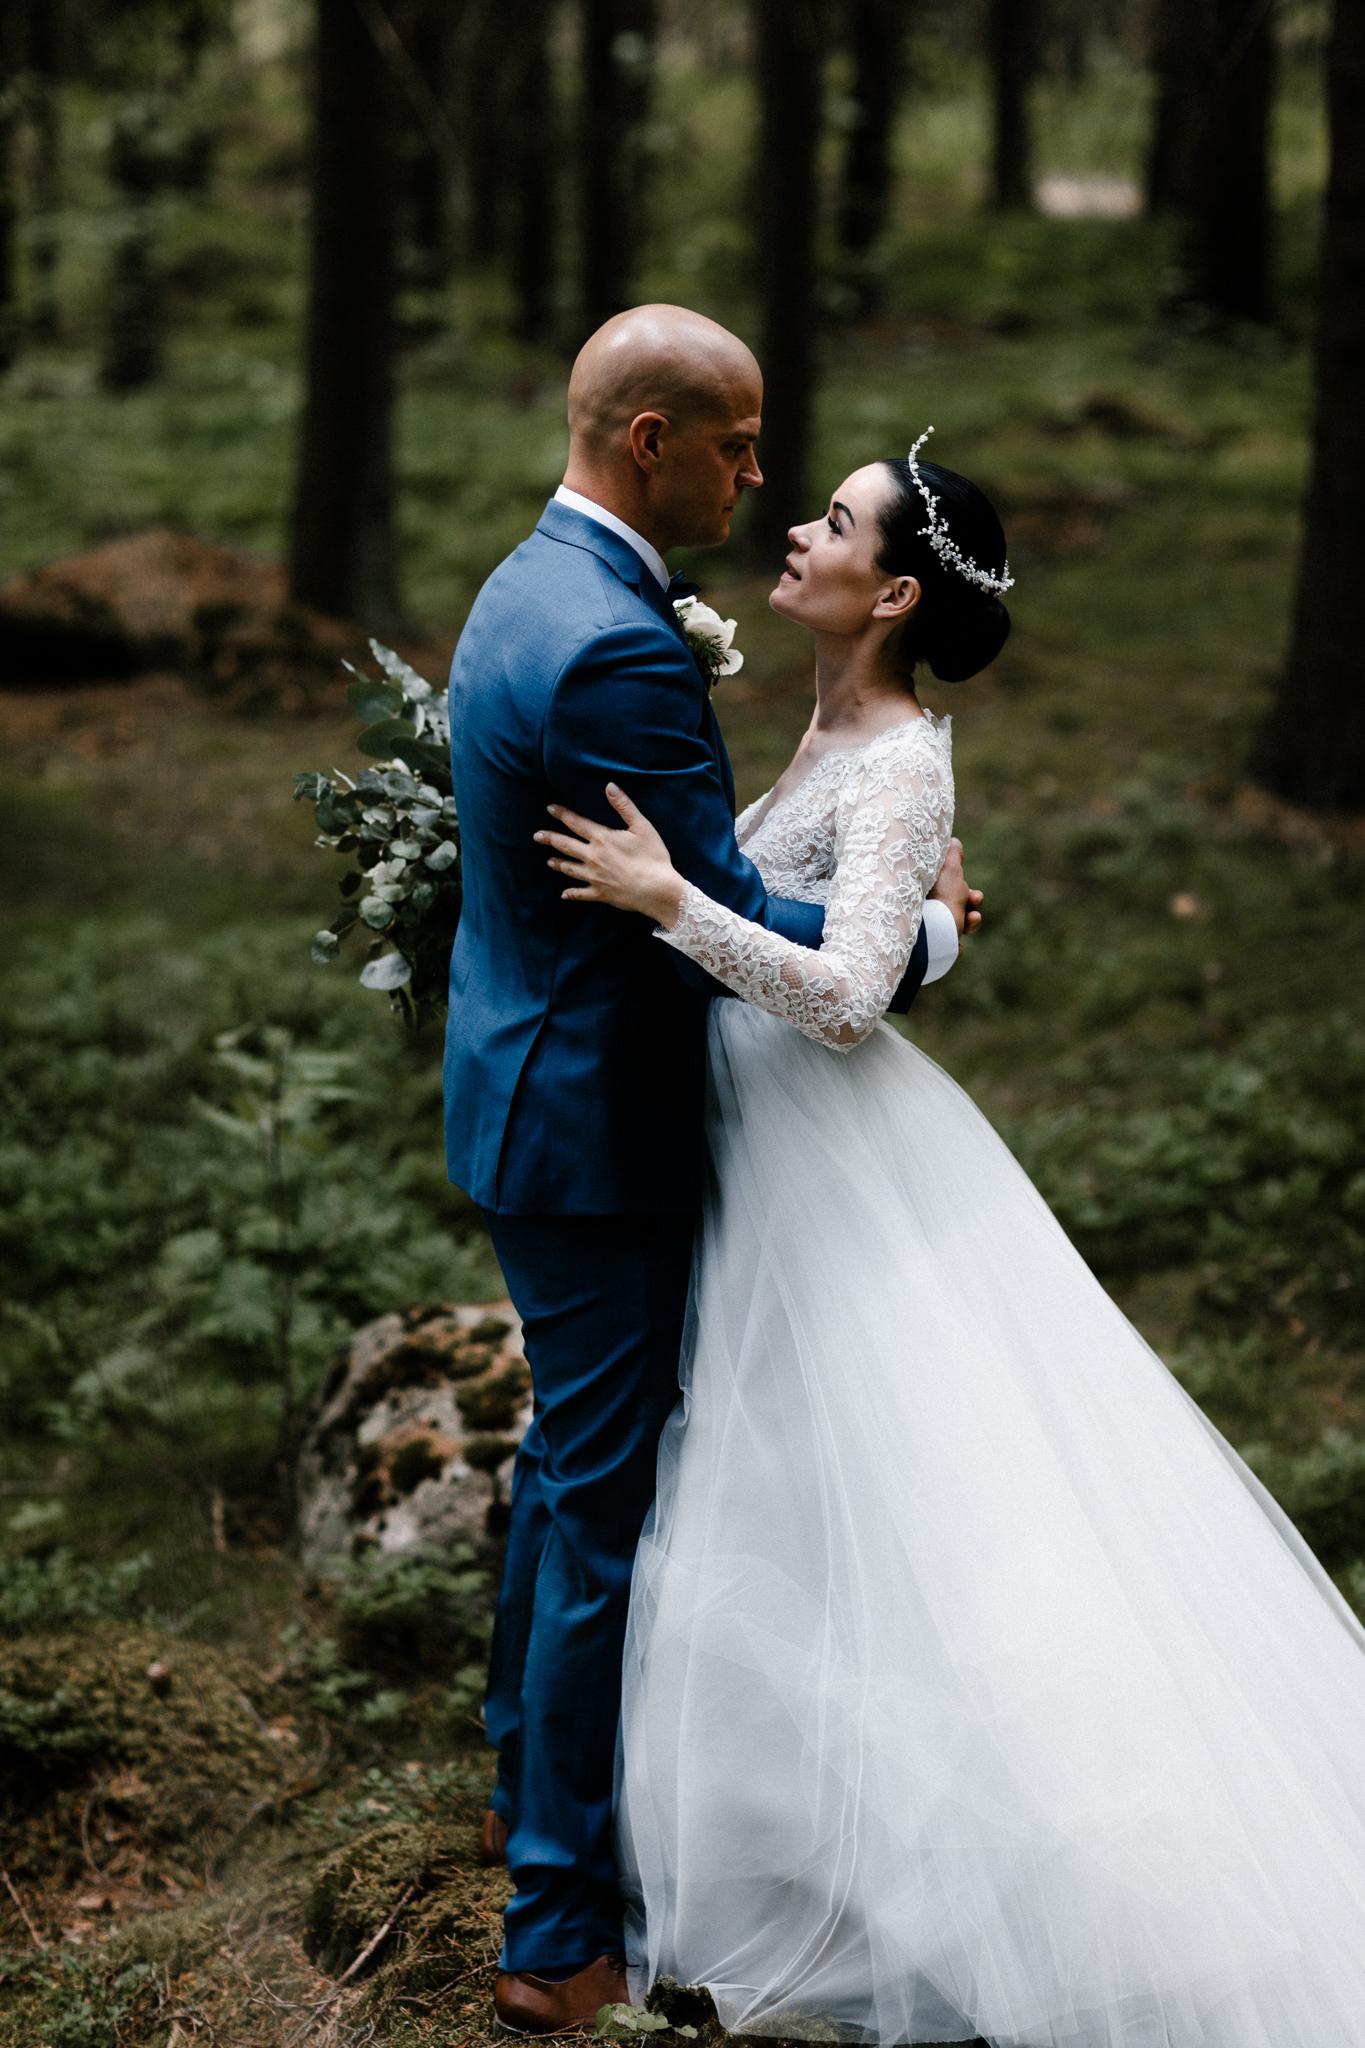 Essi + Ville   Oitbacka Gården   by Patrick Karkkolainen Wedding Photography-94.jpg